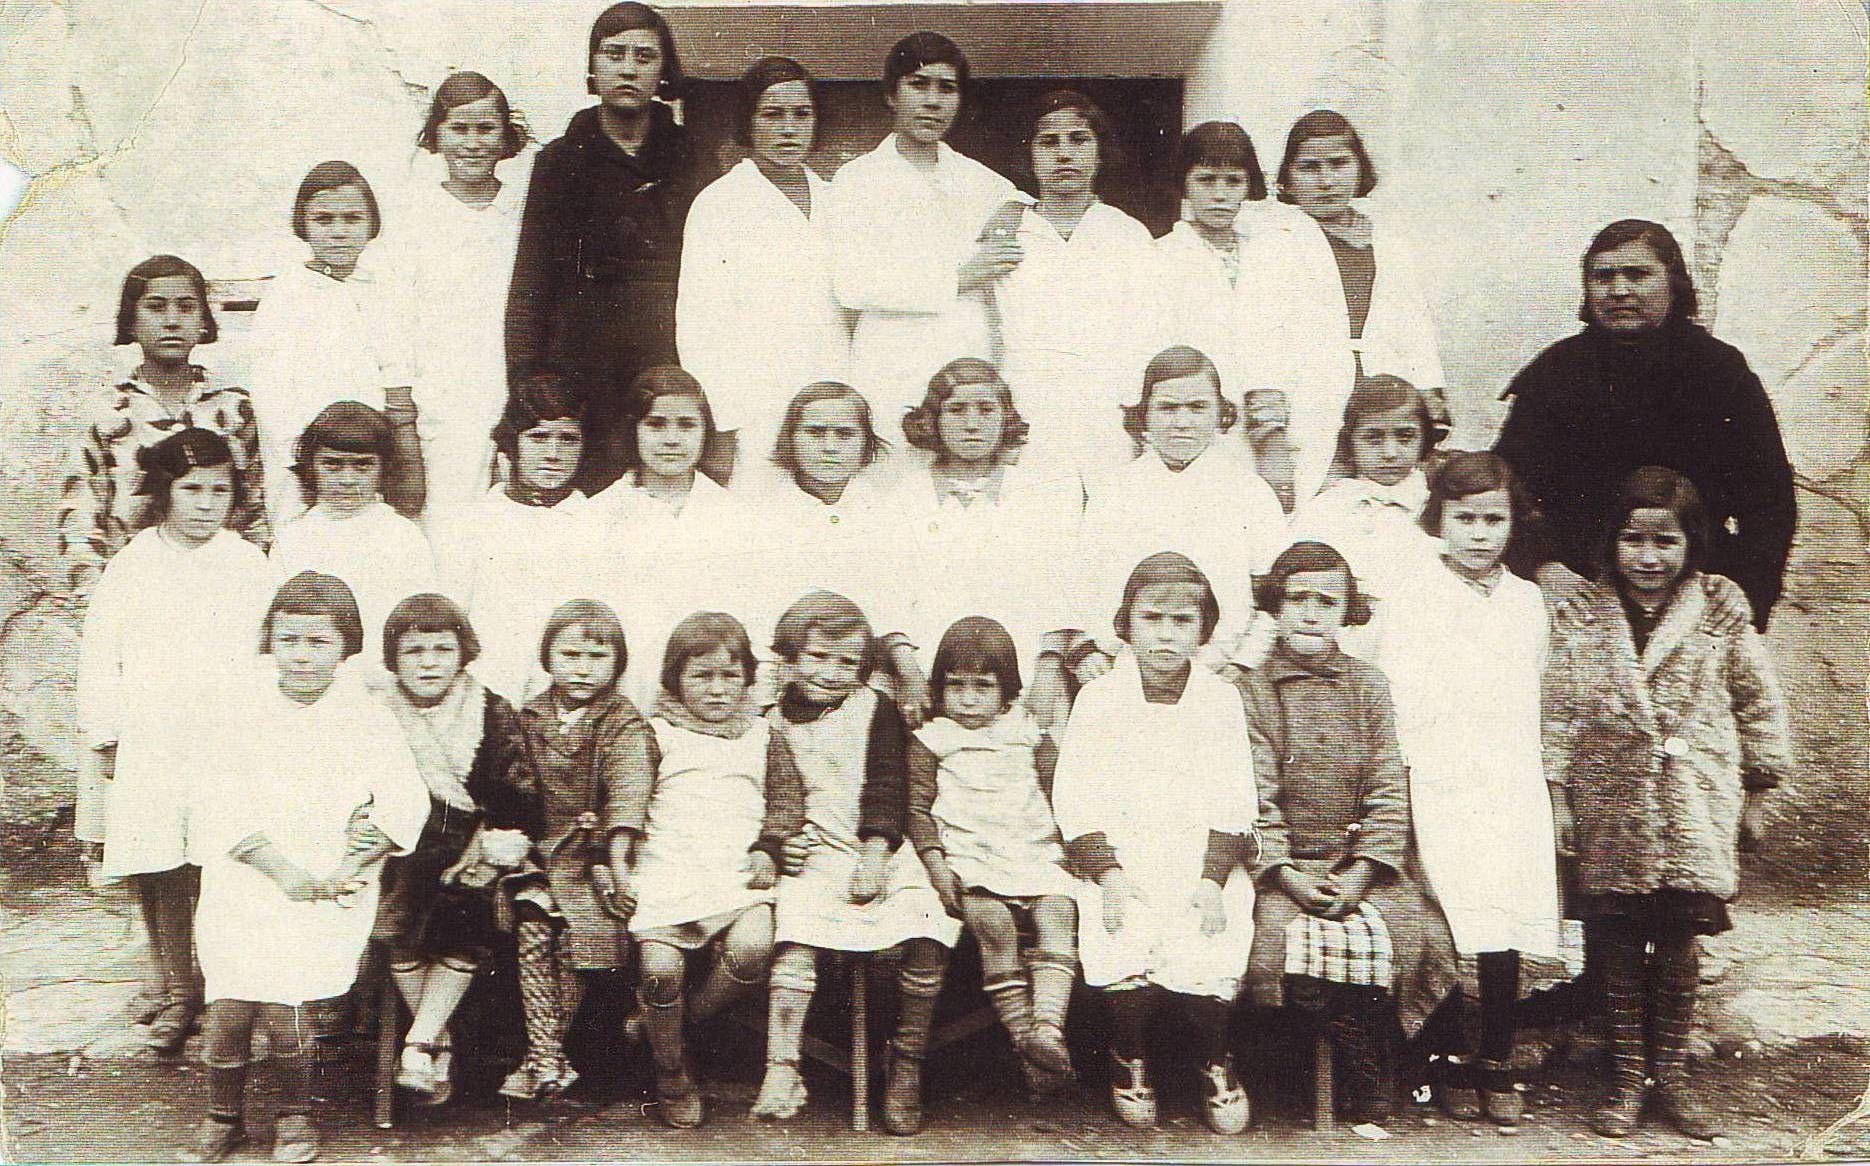 Laurentina con sus alumnas. De Sandra Abad Orós